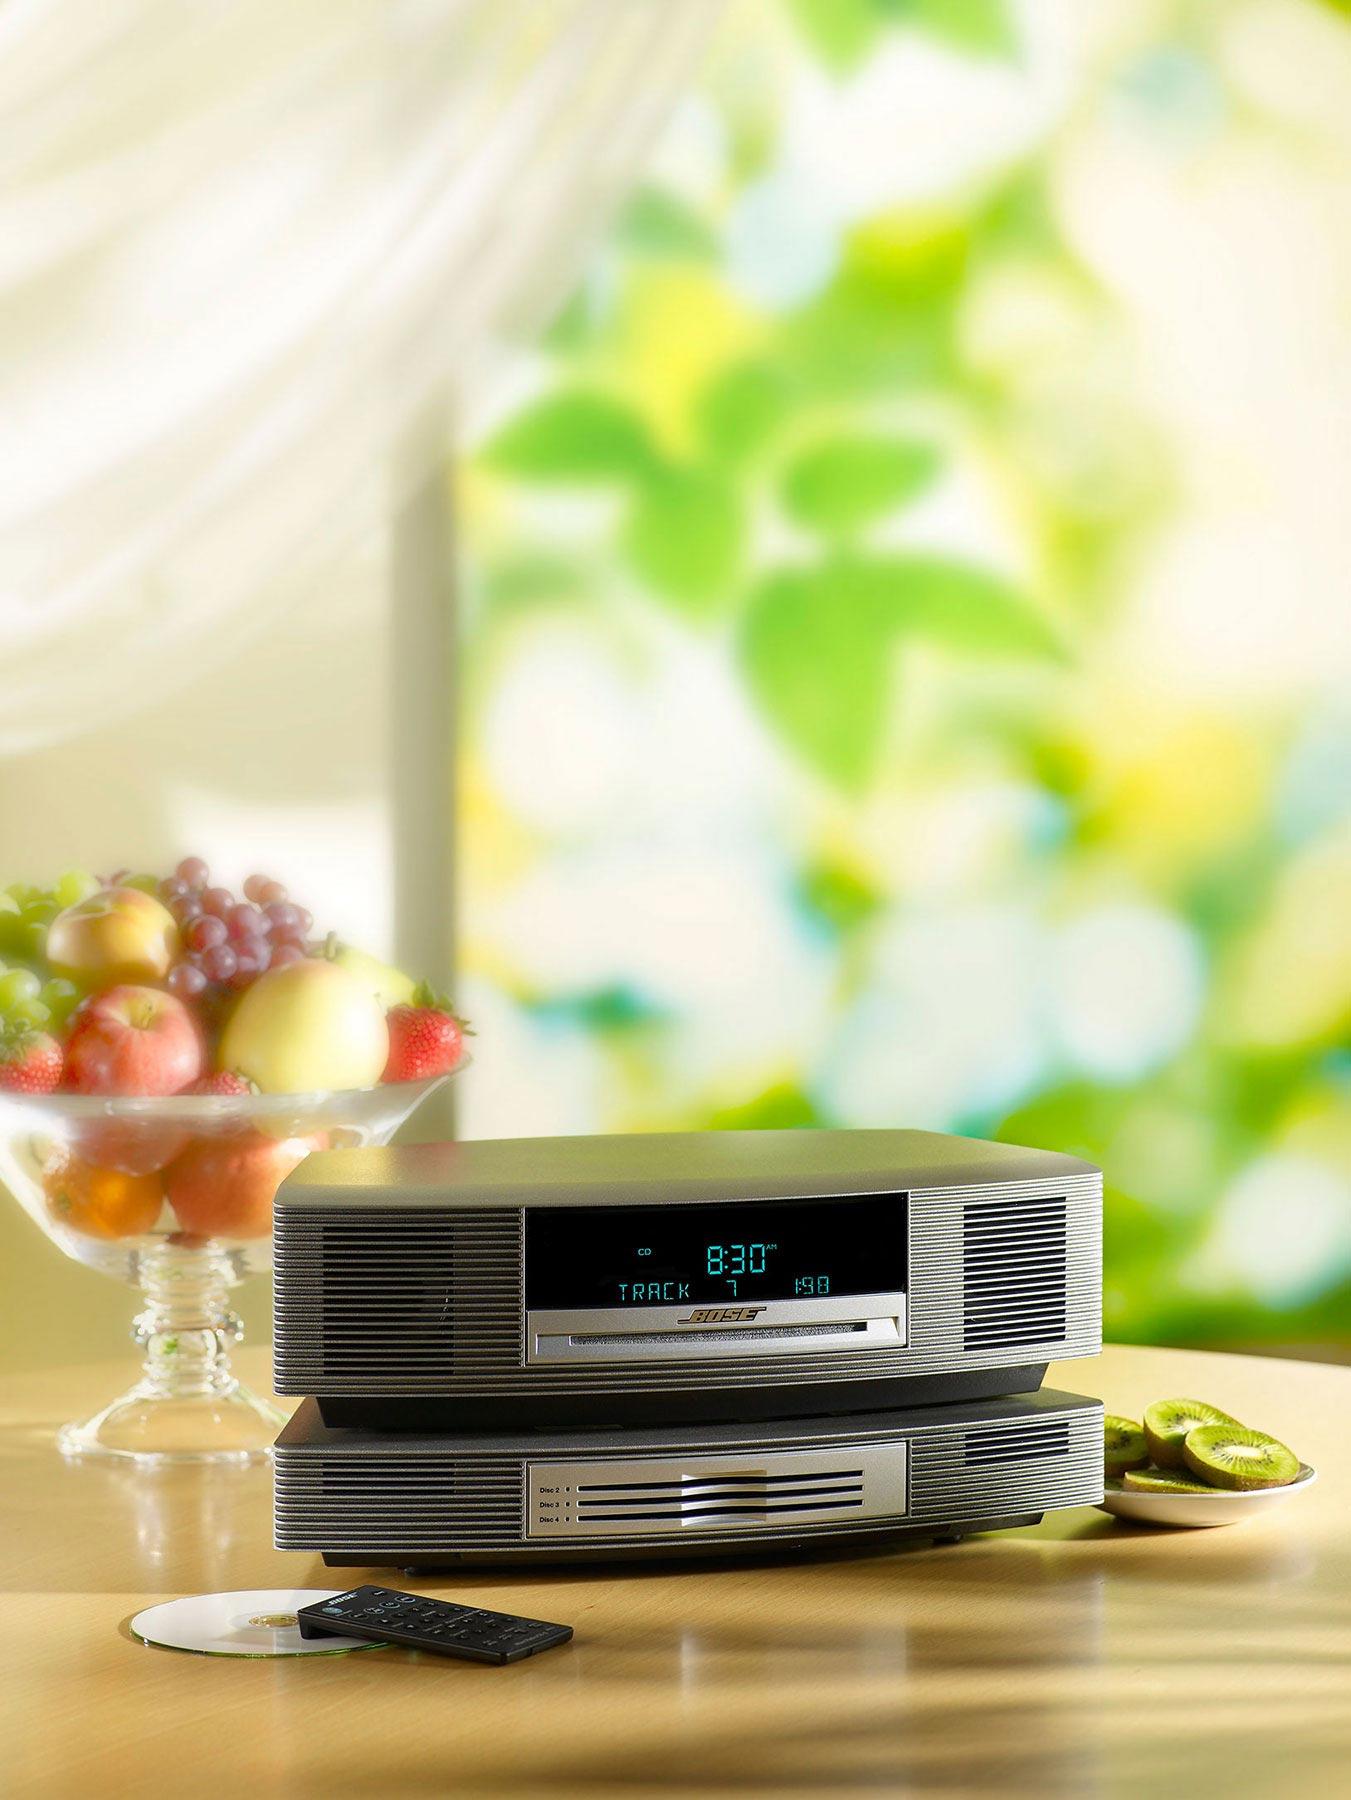 bose-radio-w-cd-and-summerfruit.jpg